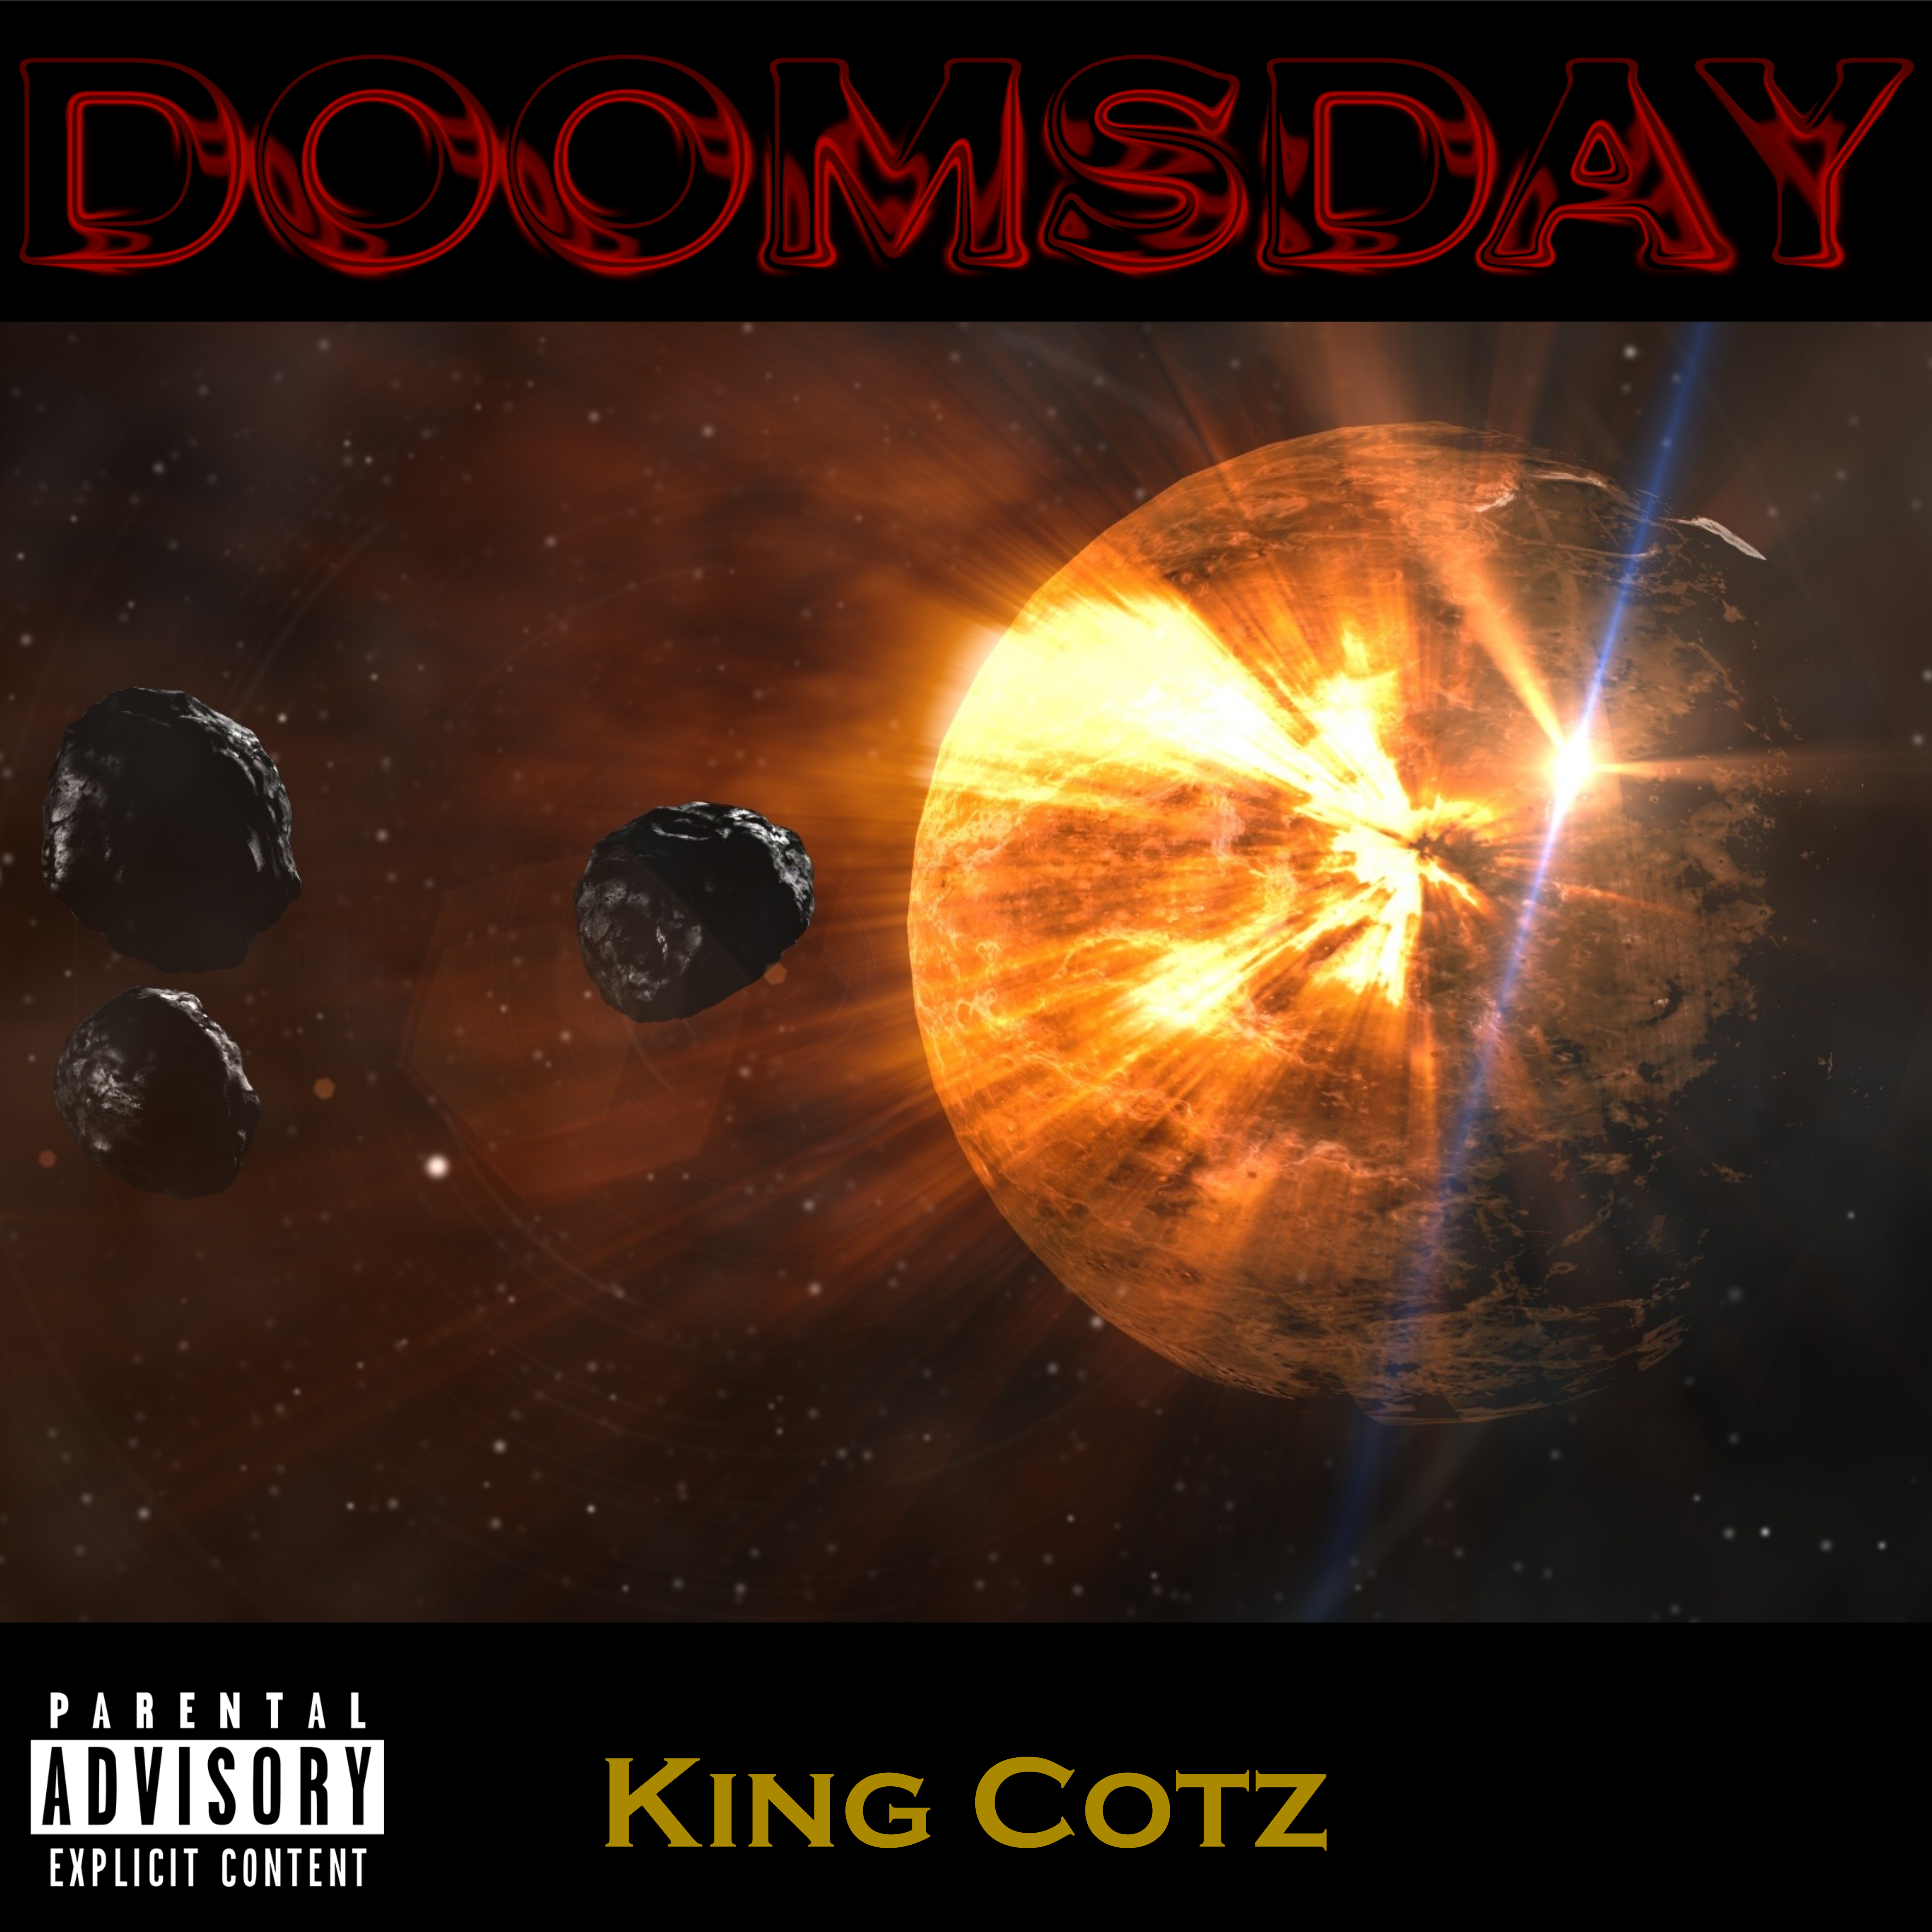 DOOMSDAY Artwork 5000x5000 - King Cotz.png